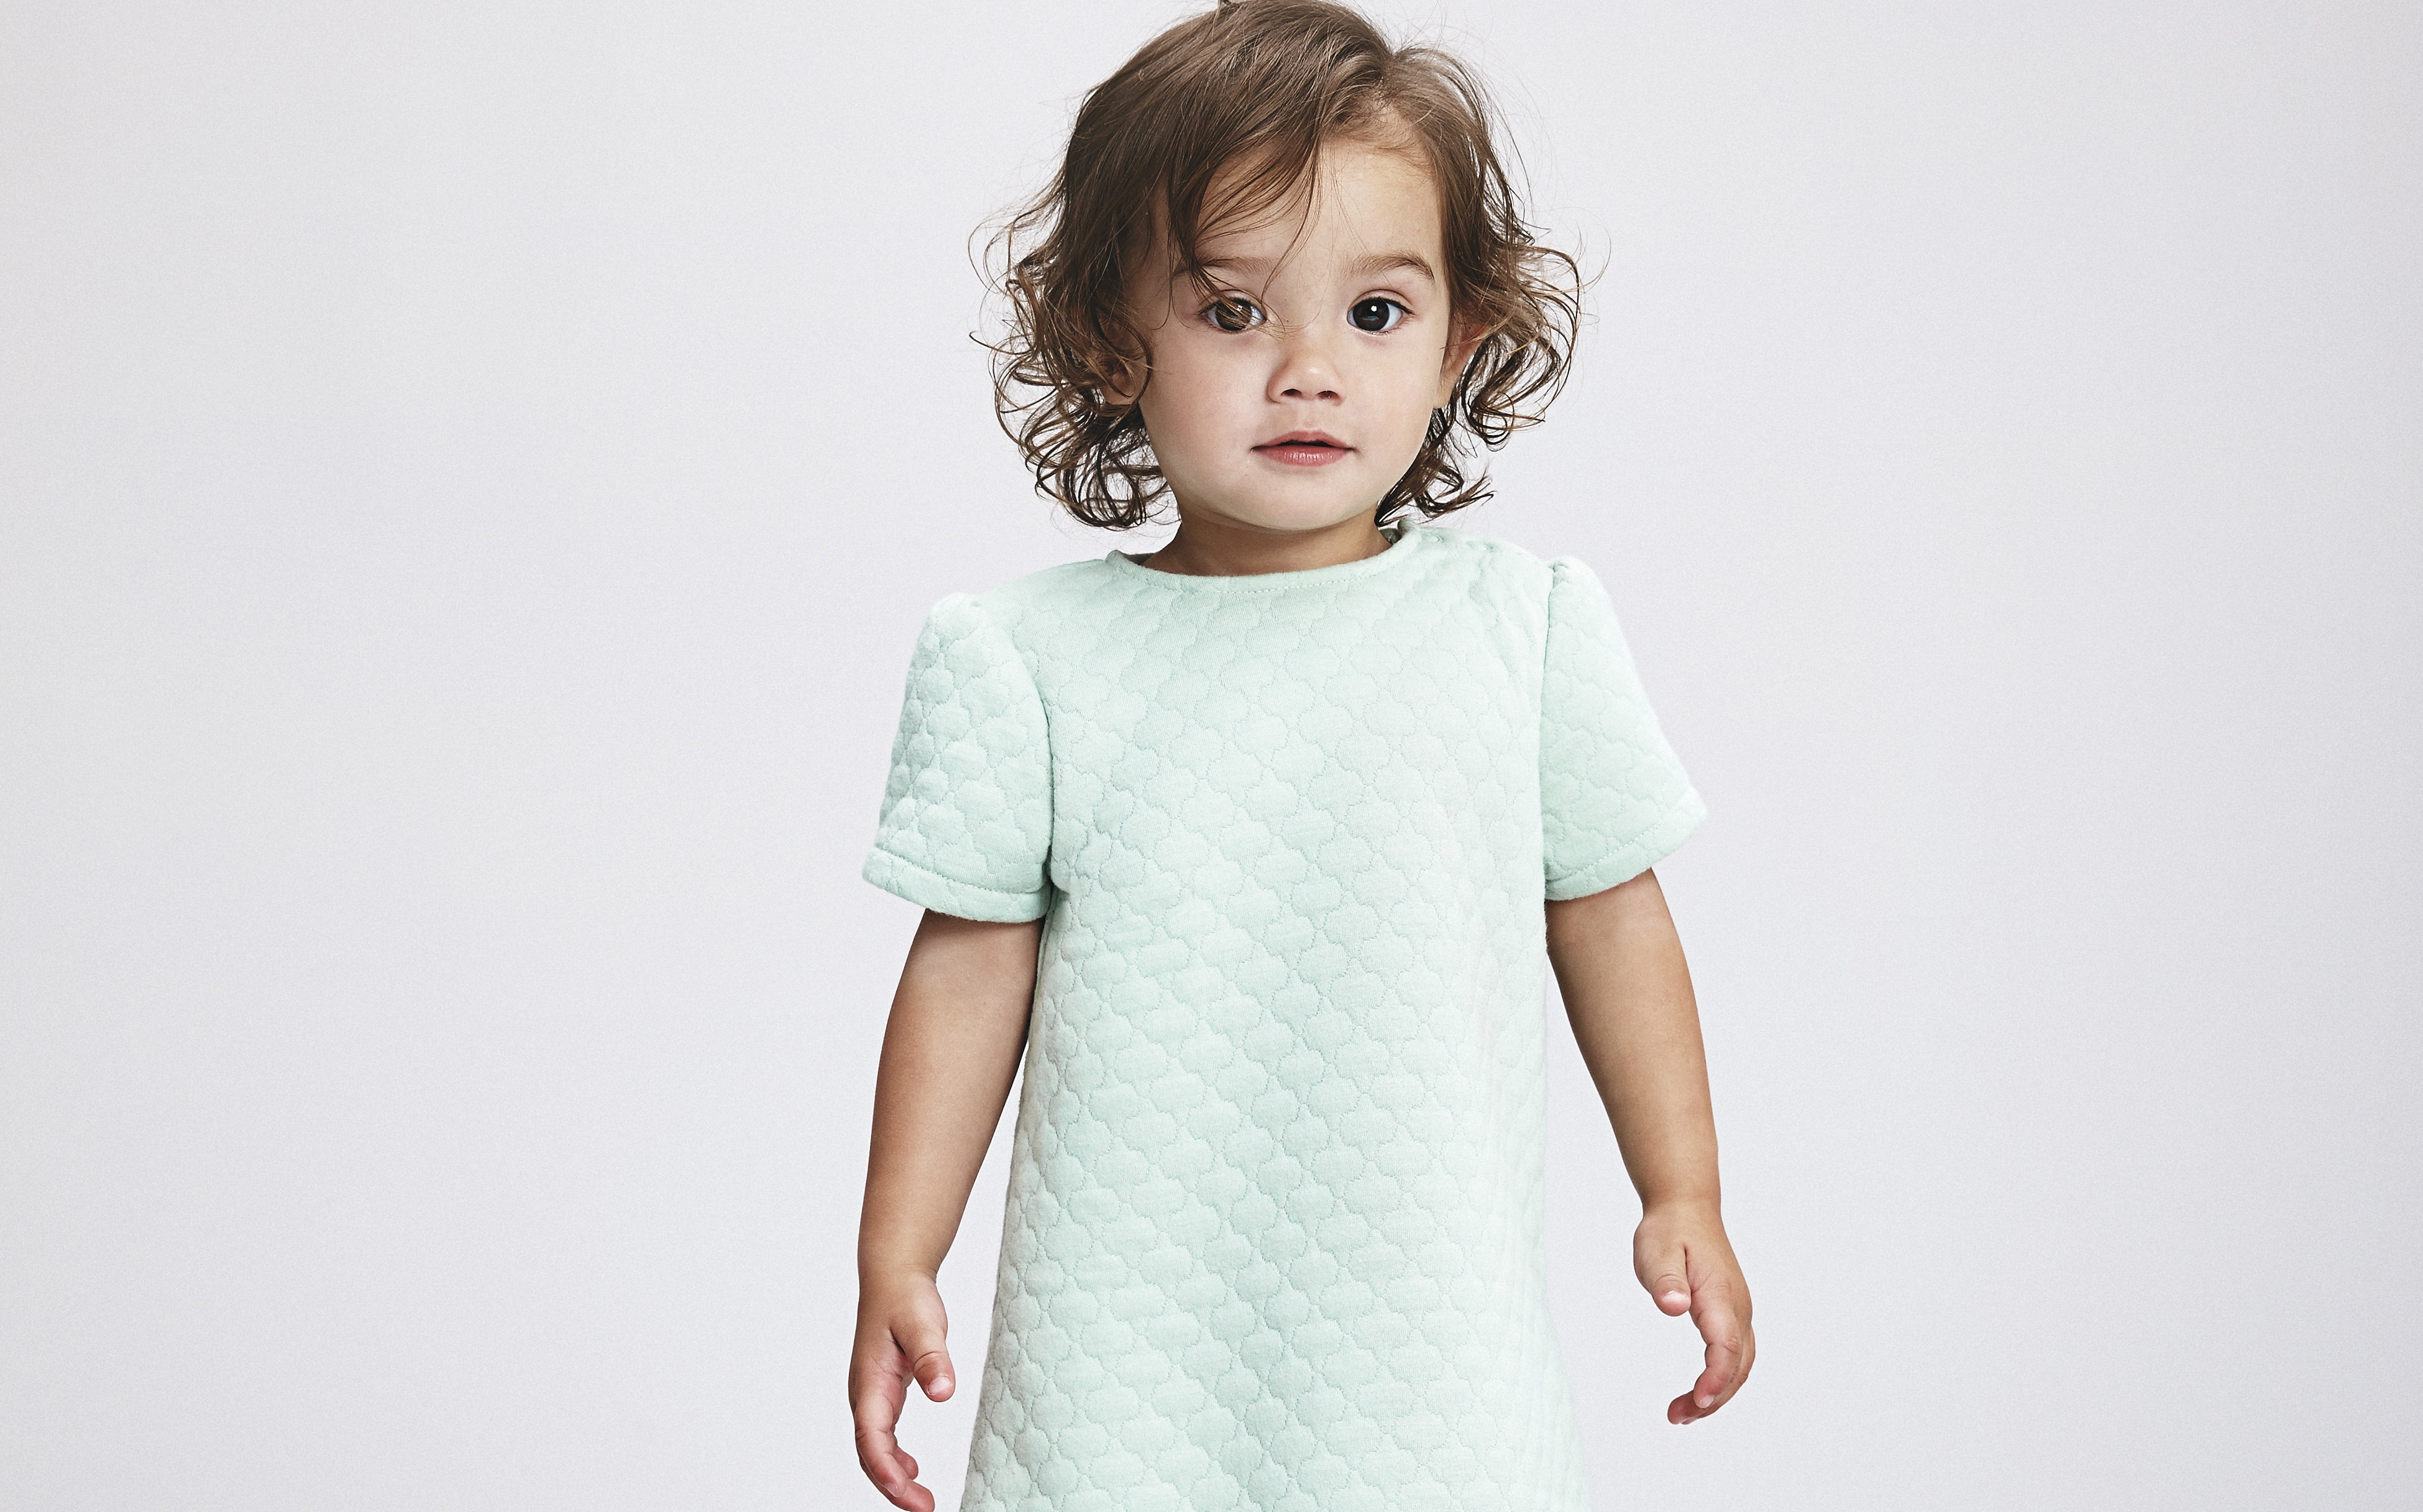 Minimize-GoodGirlsCompany-kleding van Minimize-kinderkleding-Zomerkleding voor meisjes-leuke kinderkleding-Name-it